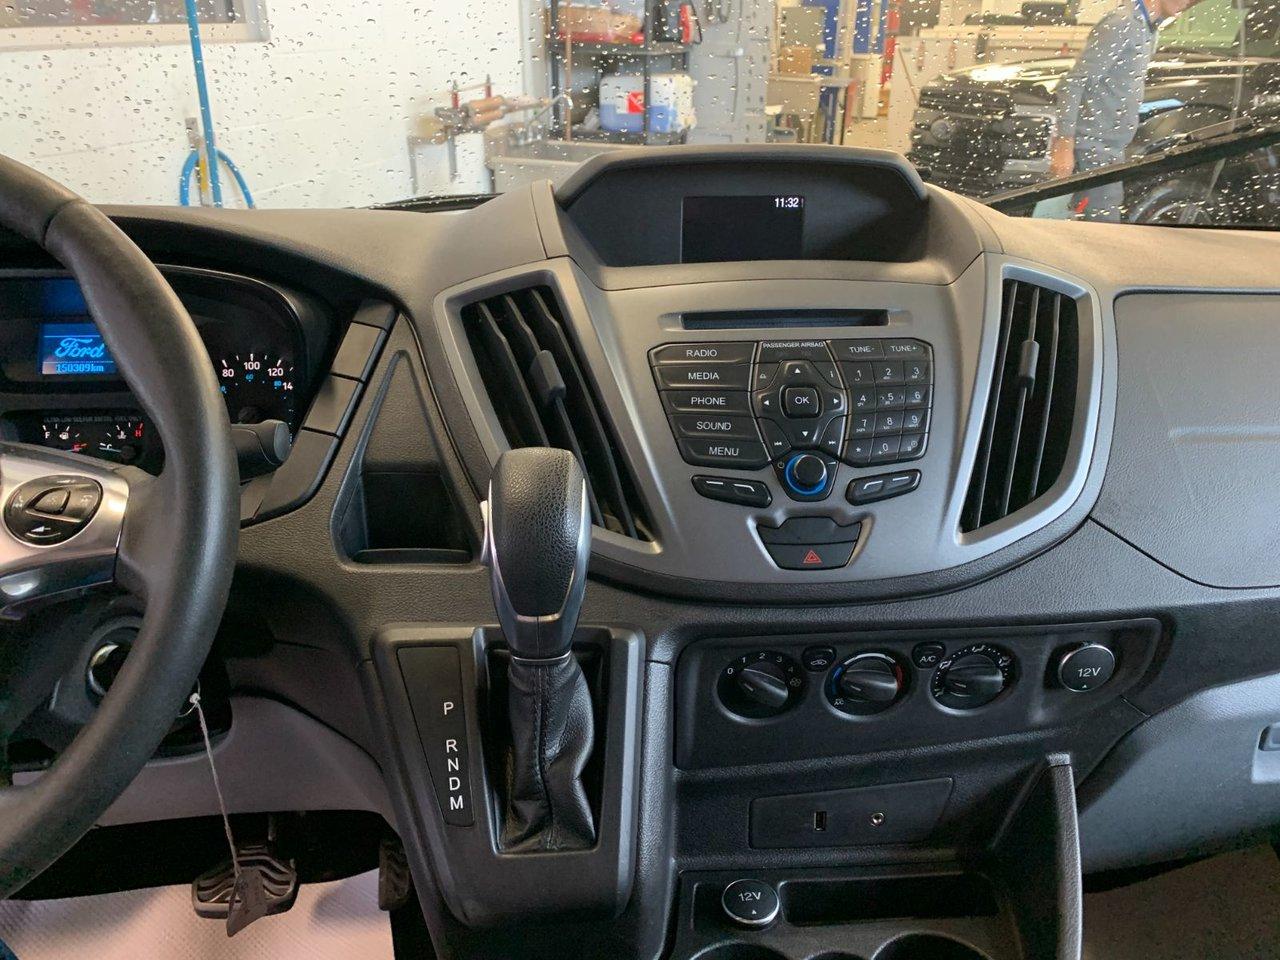 2016 Ford TRANSIT FOURGON UTILITAIRE R2C 250 CARGO DIESEL